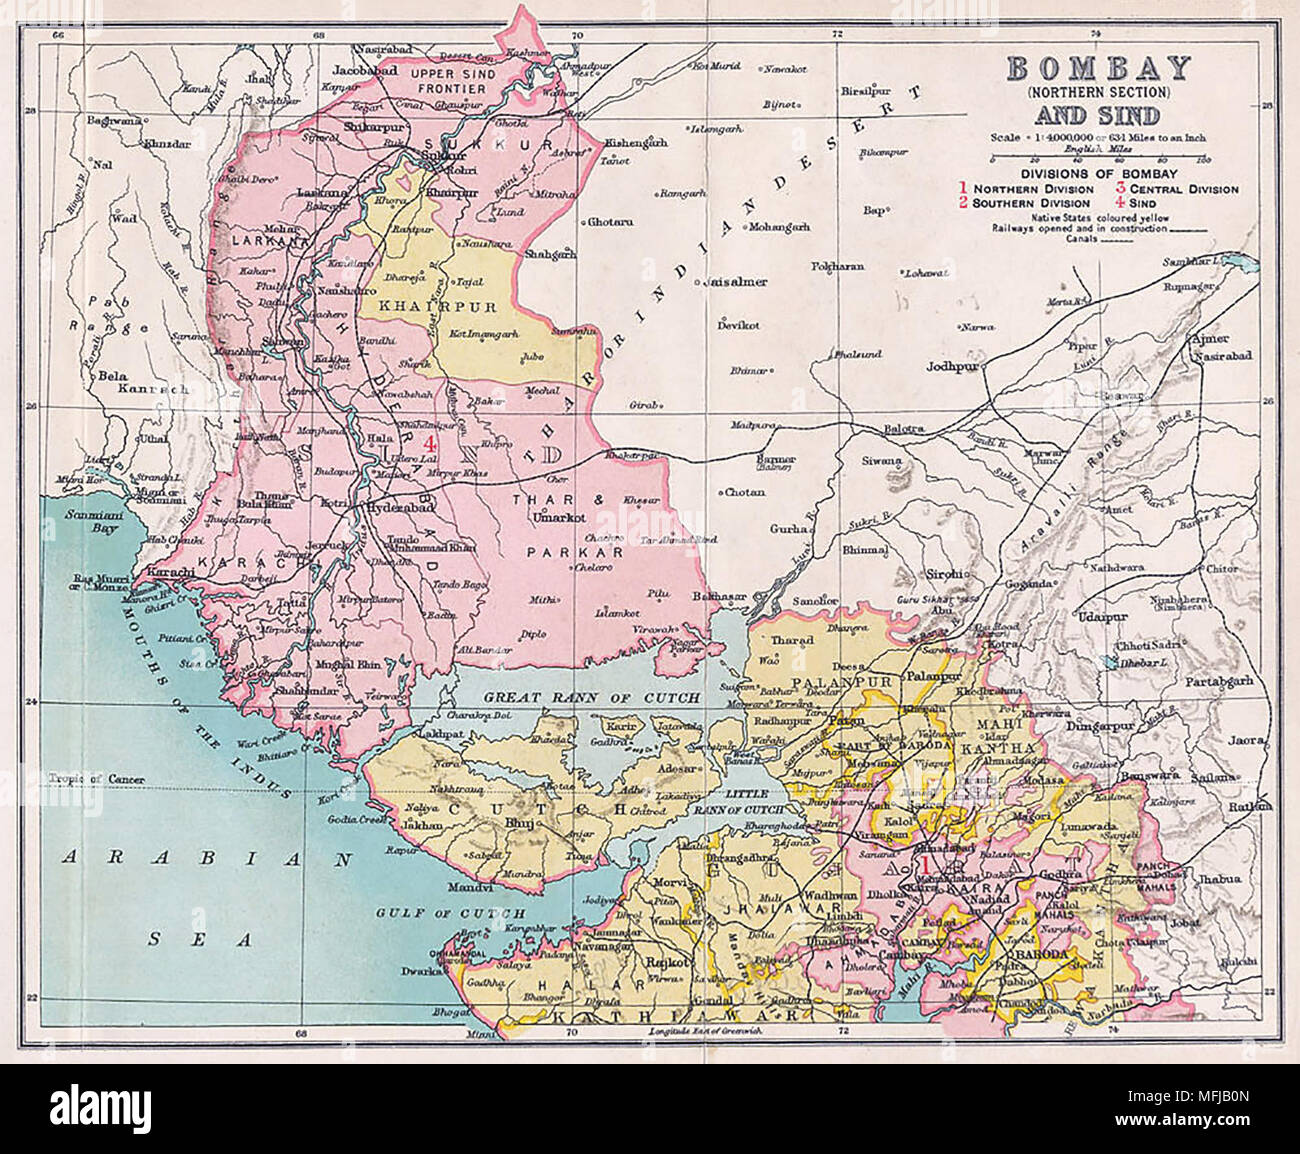 Bombay Map Stock Photos Bombay Map Stock Images Alamy